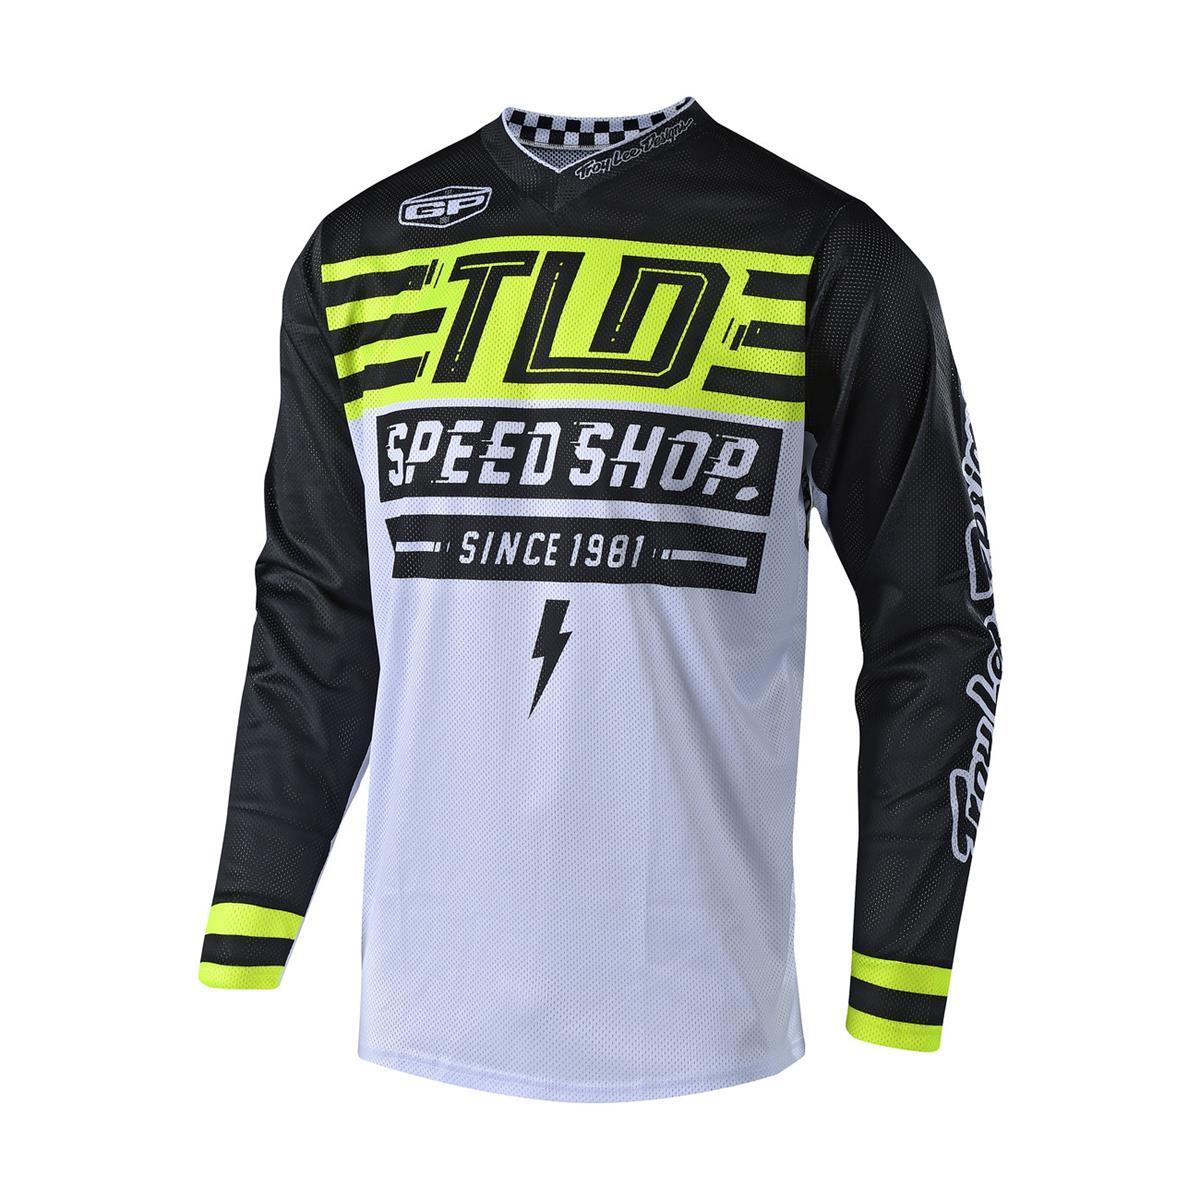 Troy Lee Designs 2019 GP Air Bolt Yellow Race Jersey Shirt Motocross Enduro